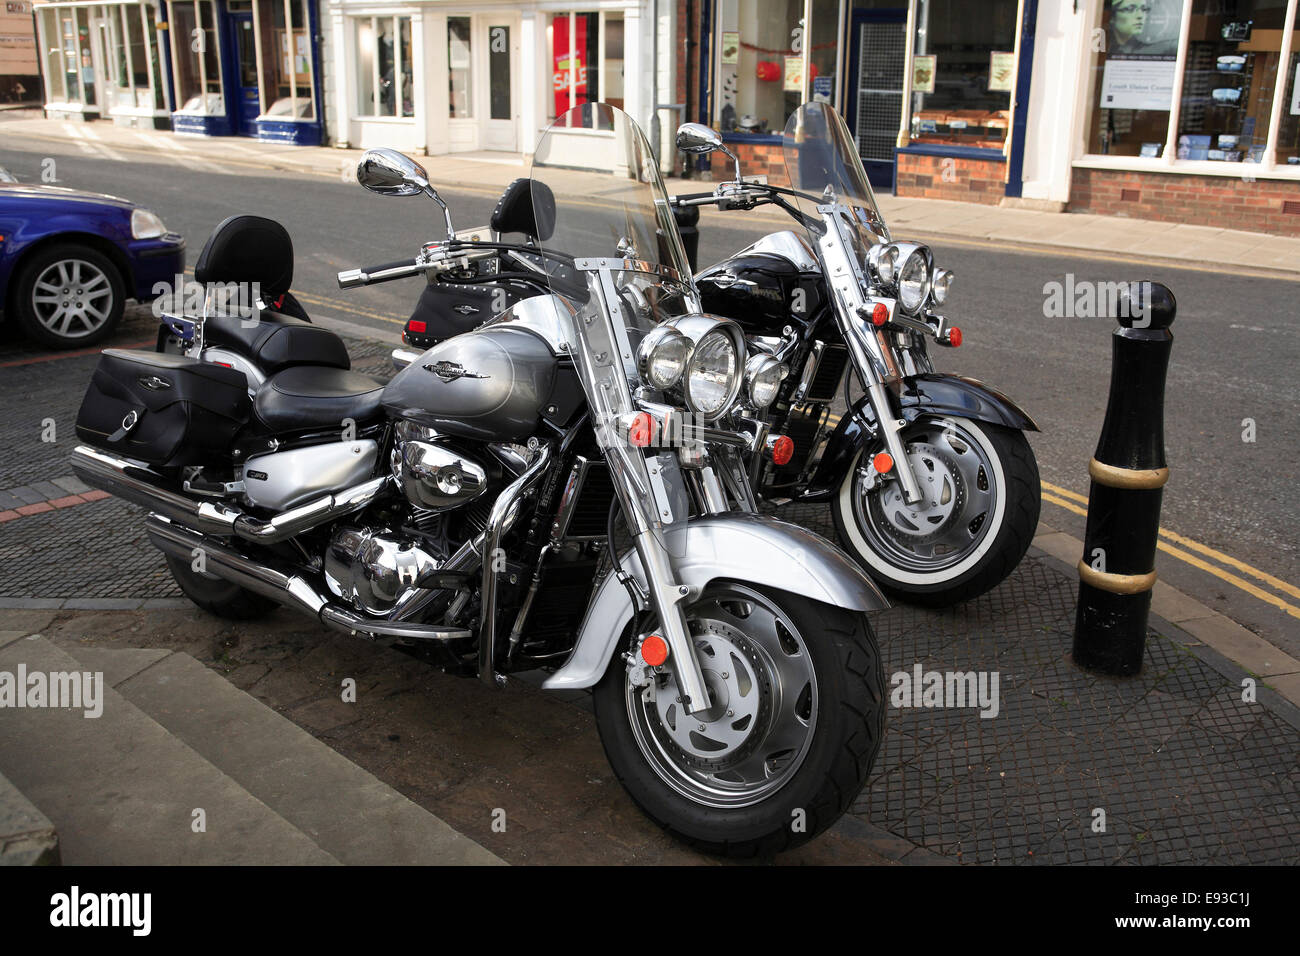 2851. Suzuki Boulevard motorbikes, UK - Stock Image